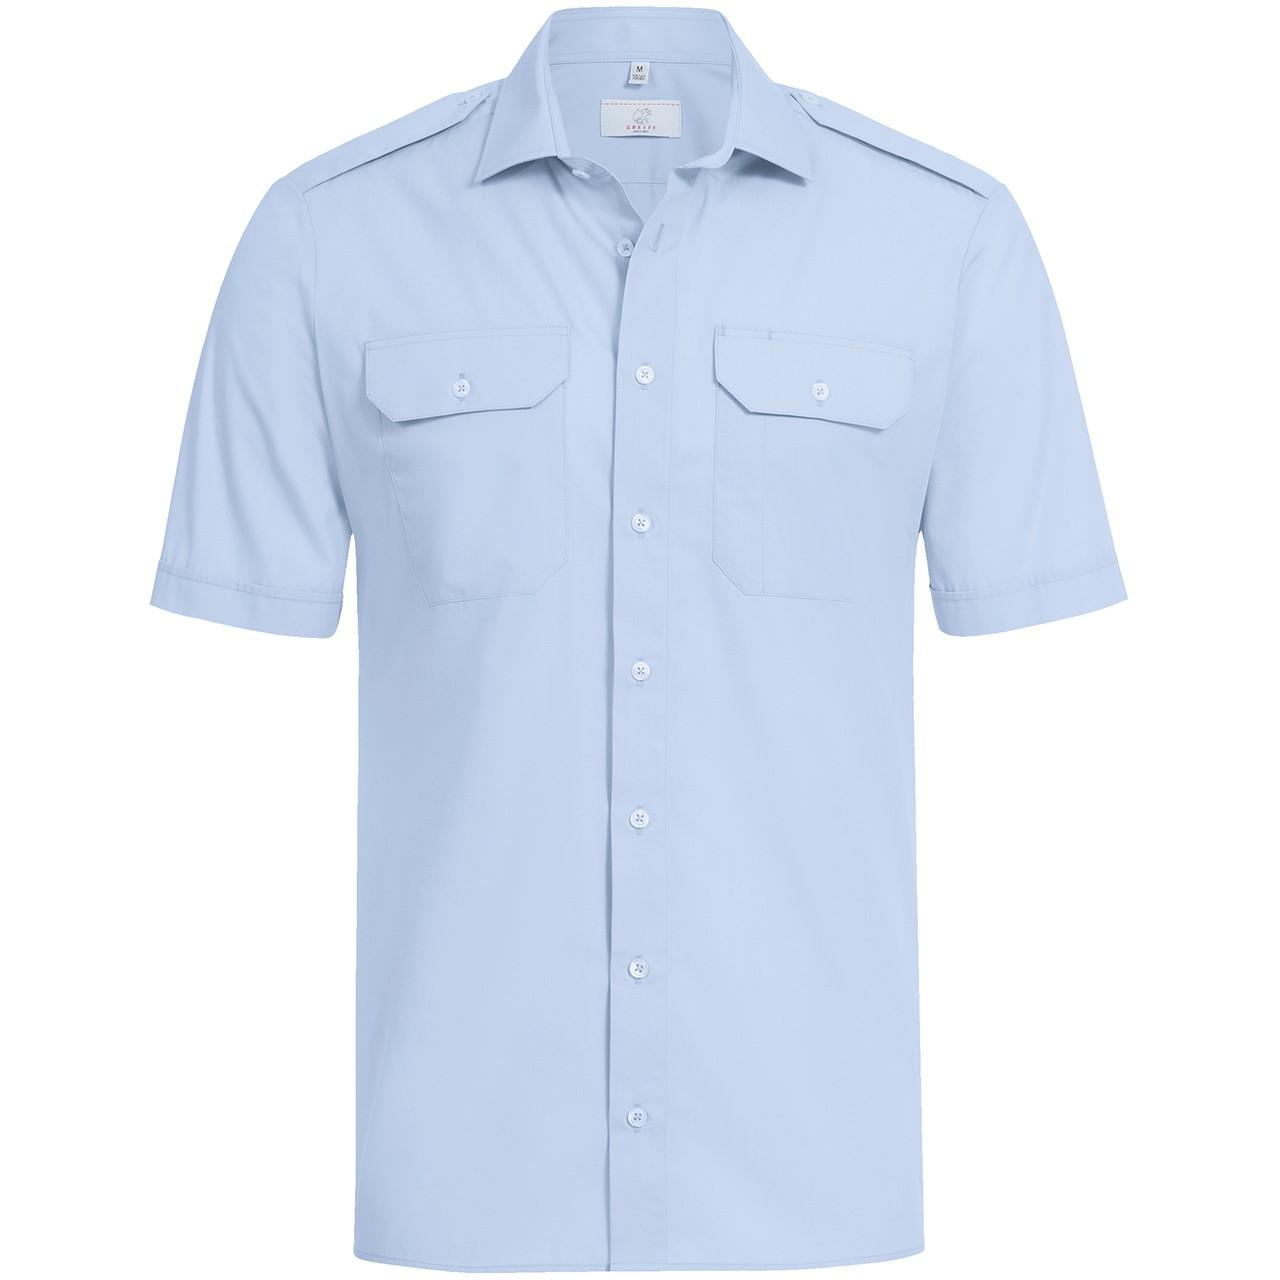 Pilothemd Kurzarm Regular Fit Greiff® | bedrucken, besticken, bedrucken lassen, besticken lassen, mit Logo |